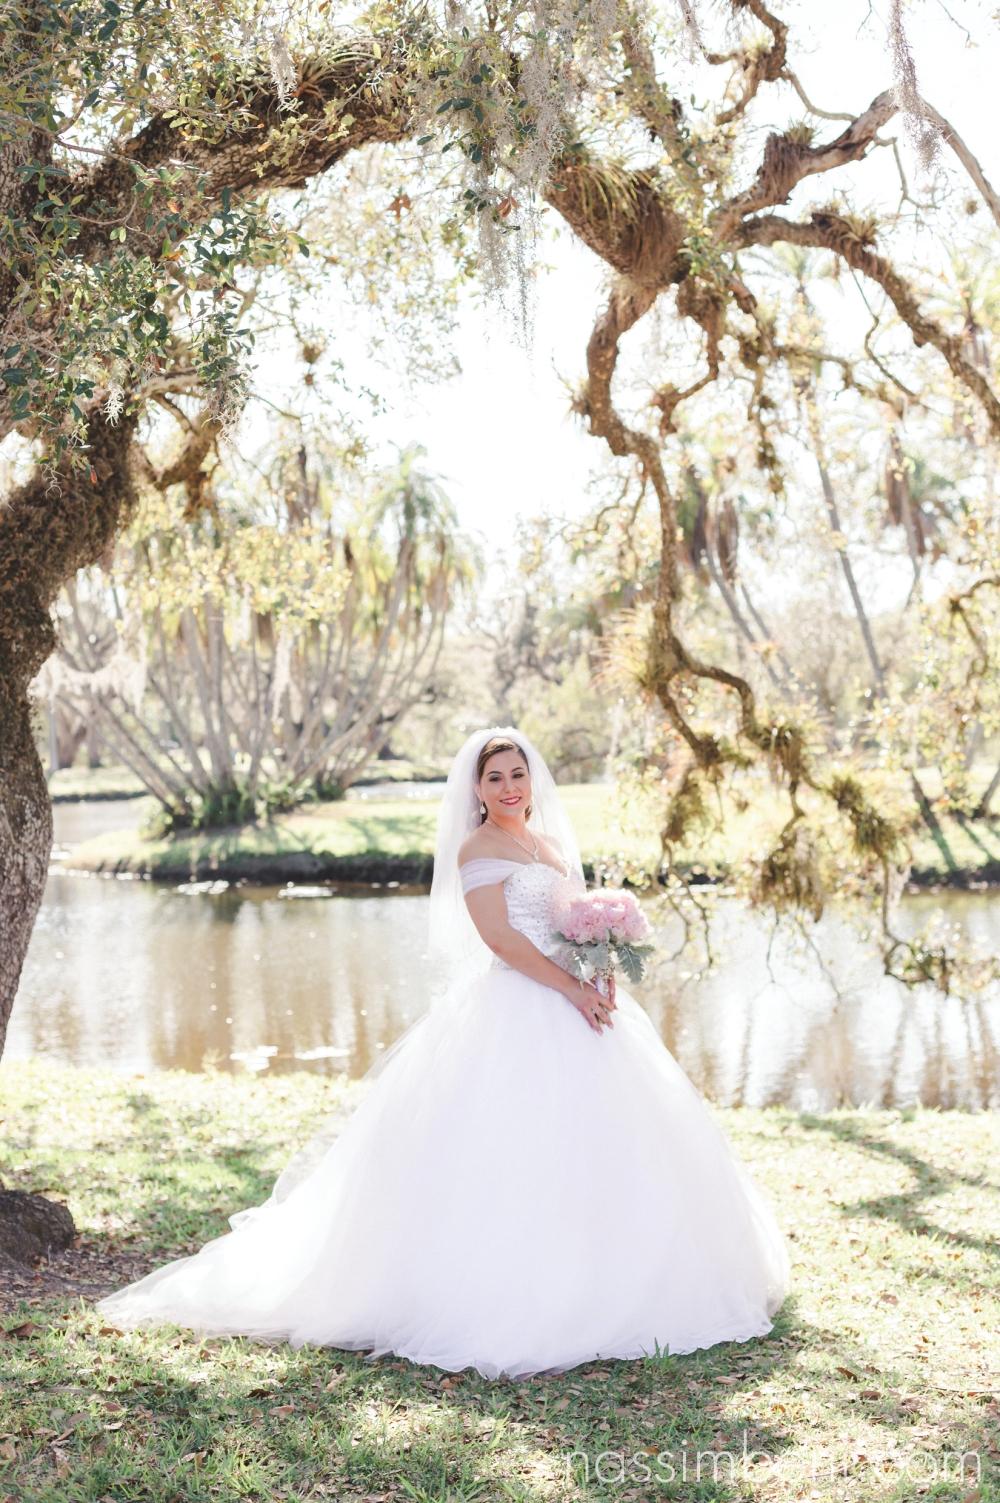 light-and-airy-port-st-lucie-wedding-photographer-nassimbeni-photography-28